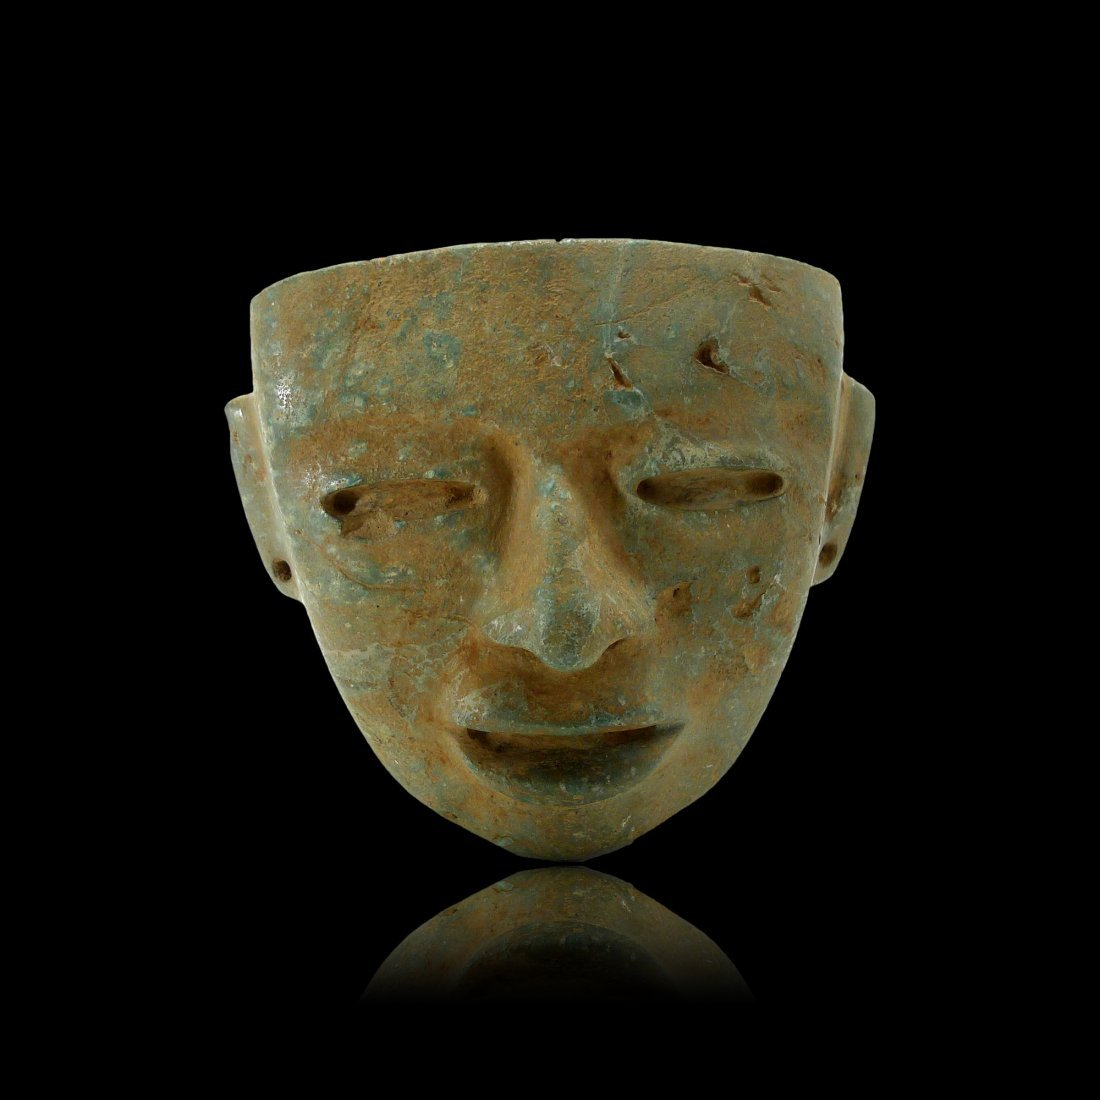 Pre-columbian Teotihuacan Death Mask